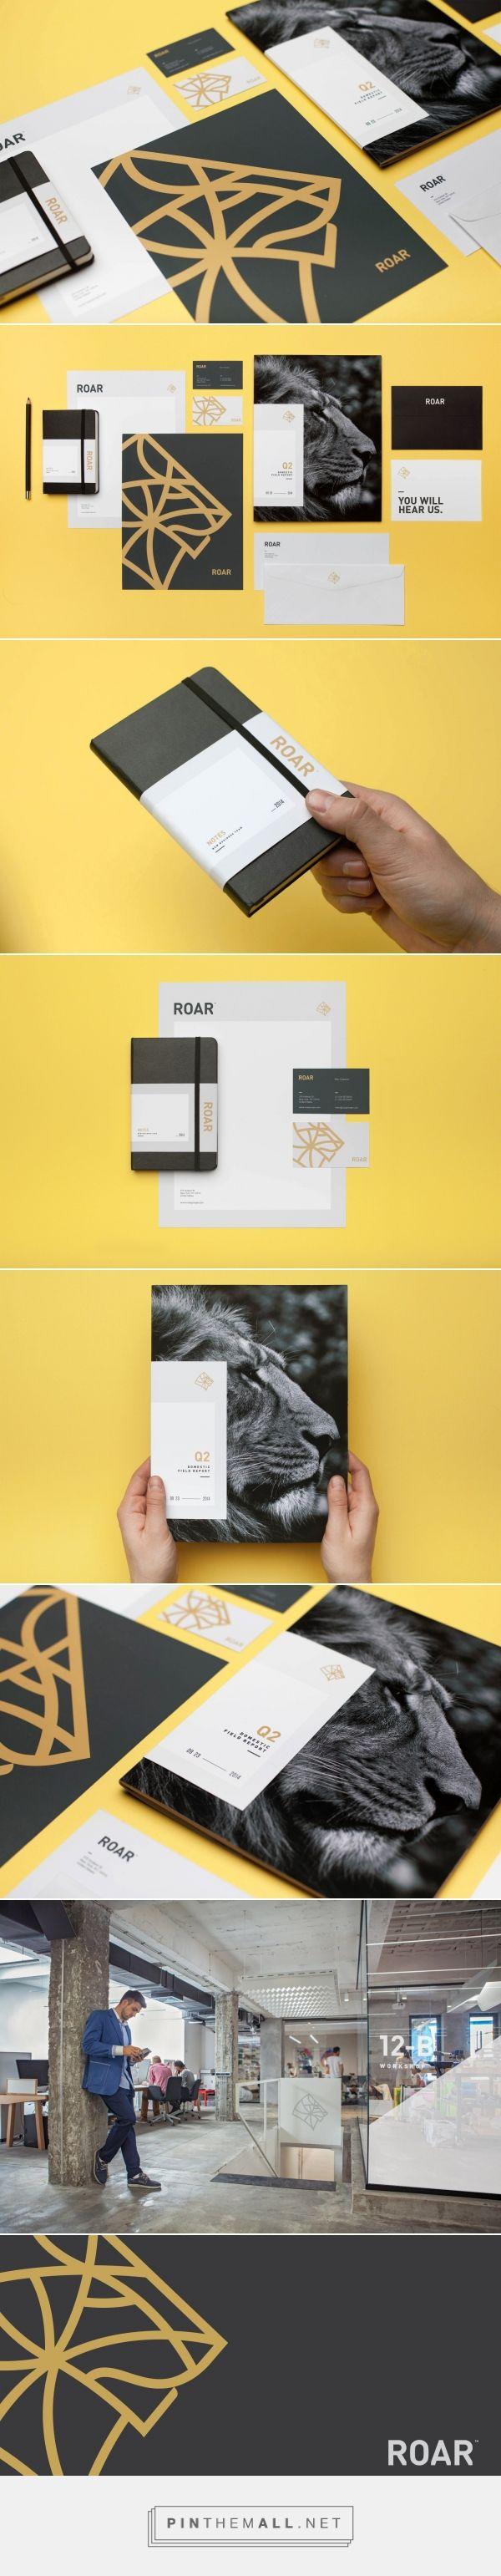 Roar Groupe | Mast | Fivestar Branding – Design and Branding Agency & Inspiration Gallery